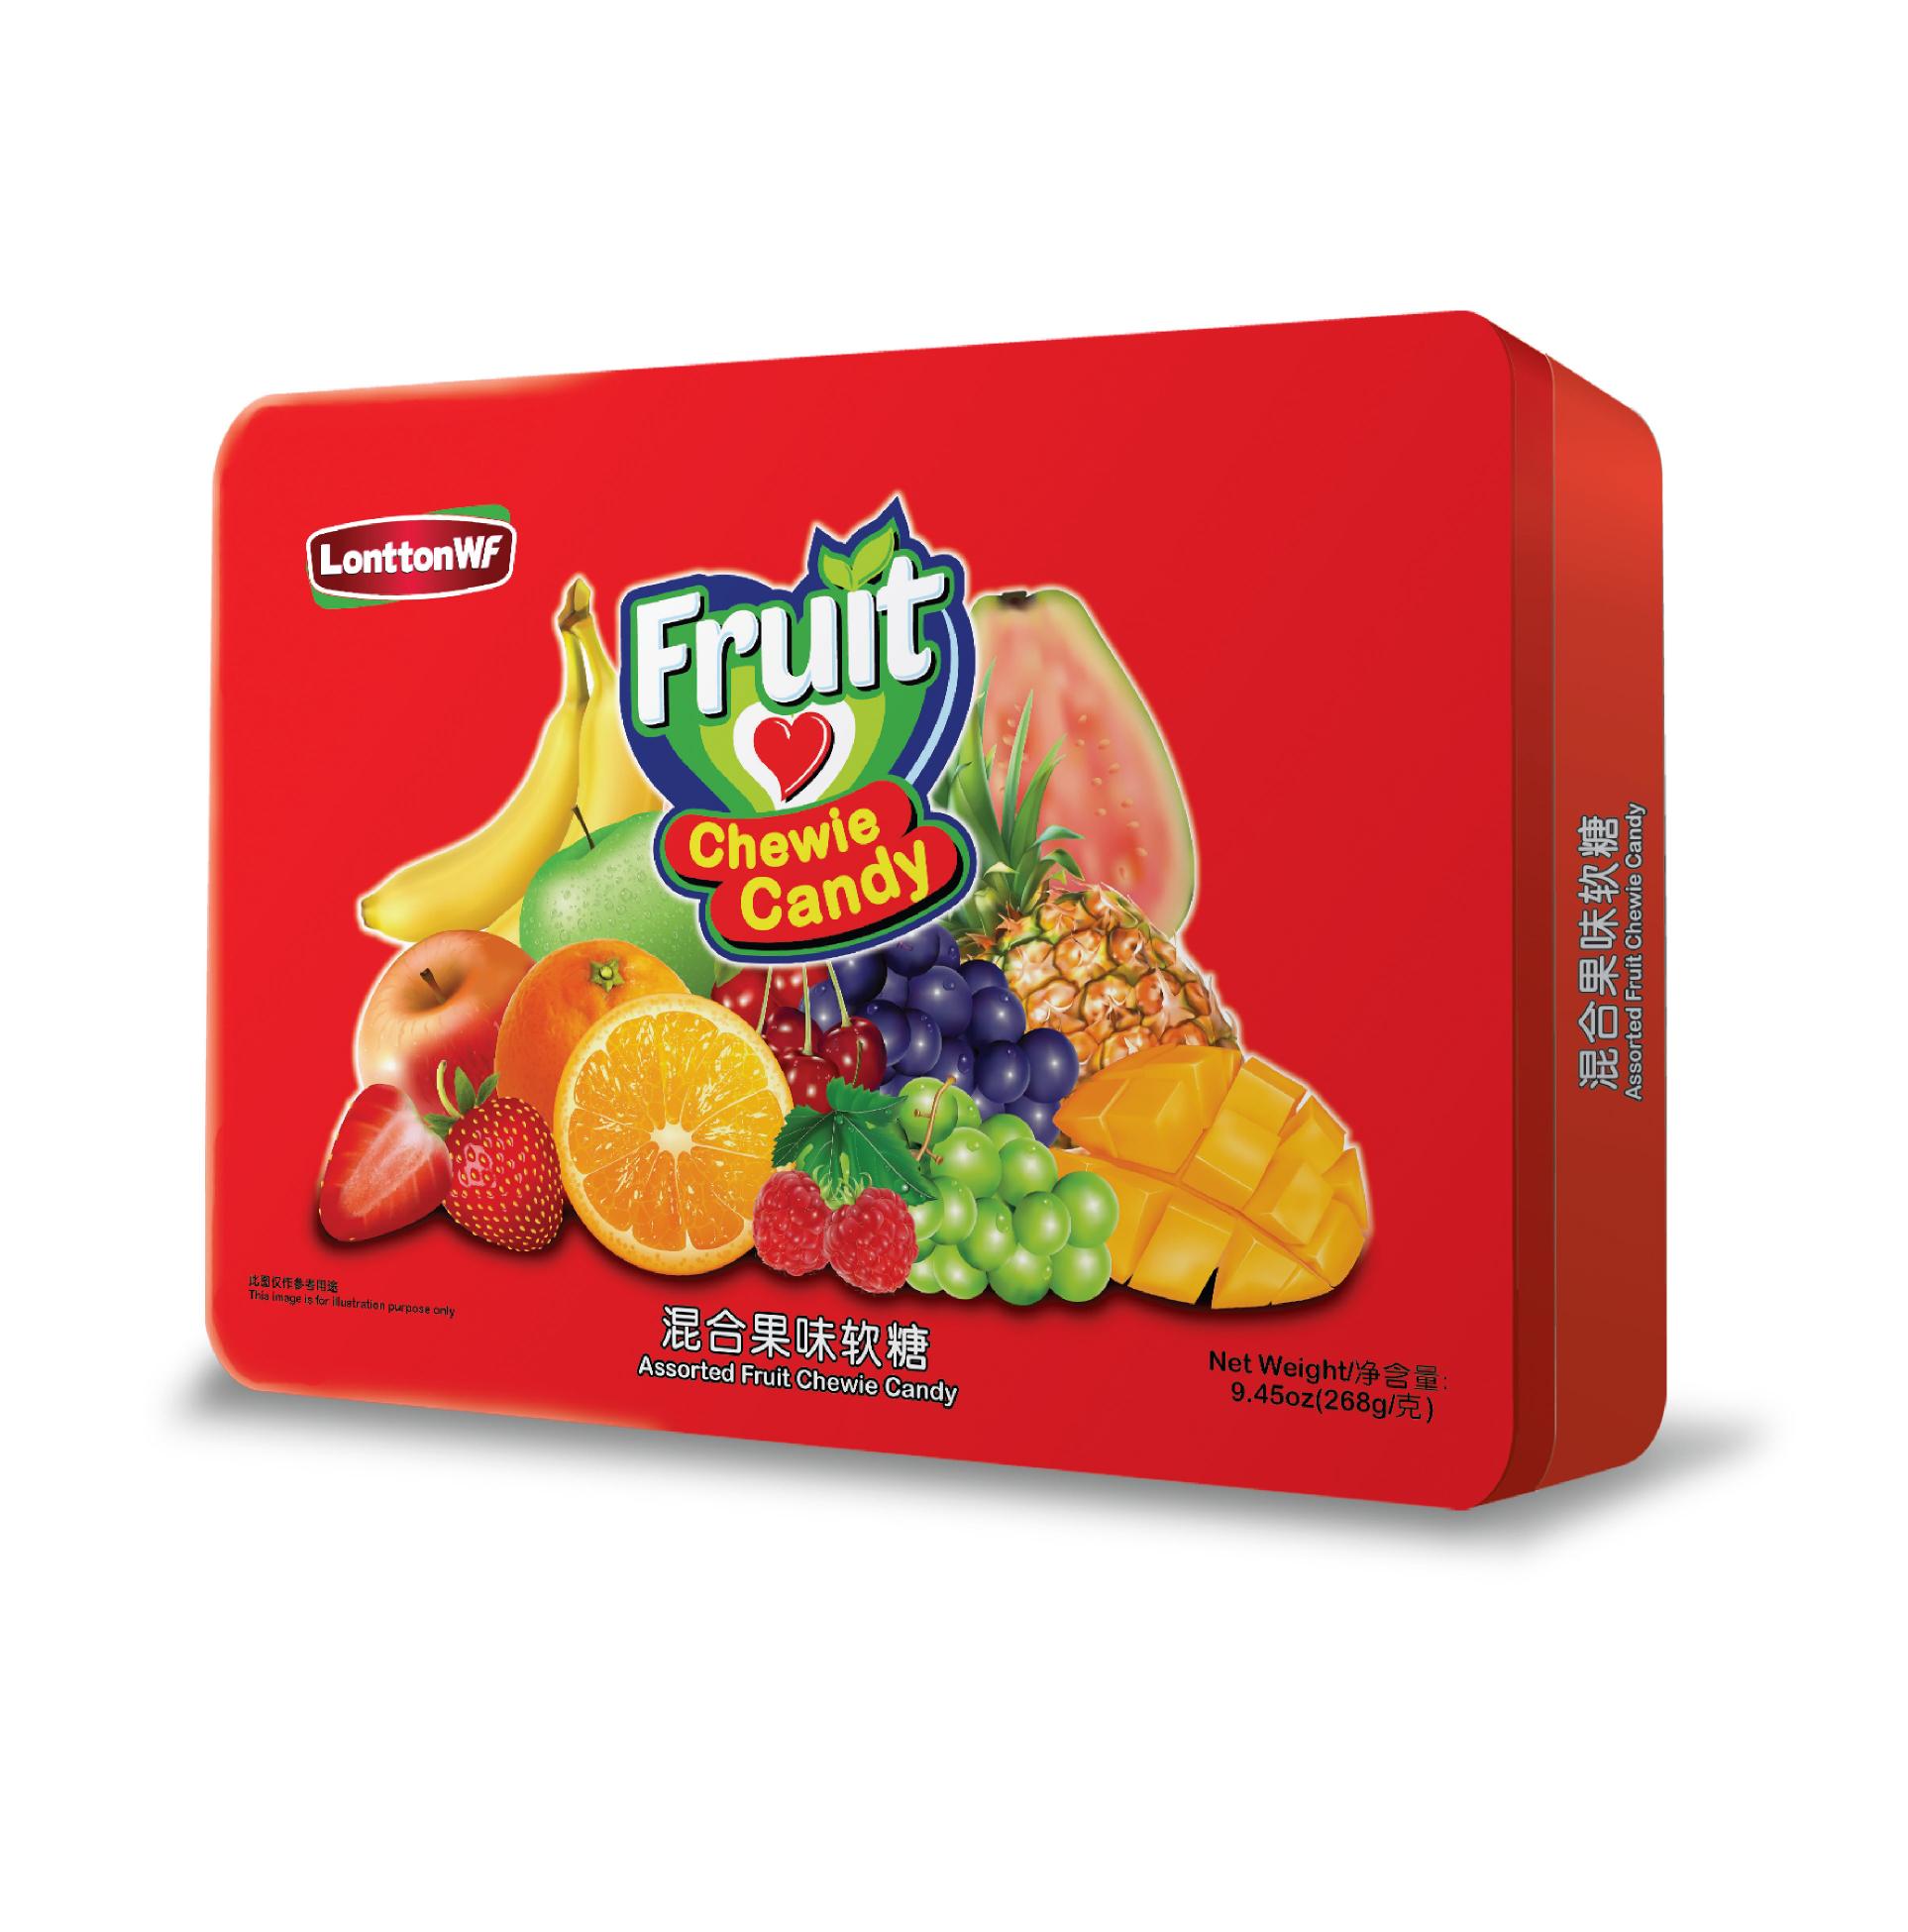 WF-LT FruitLove CCandyTin (Building)-3D-01-02